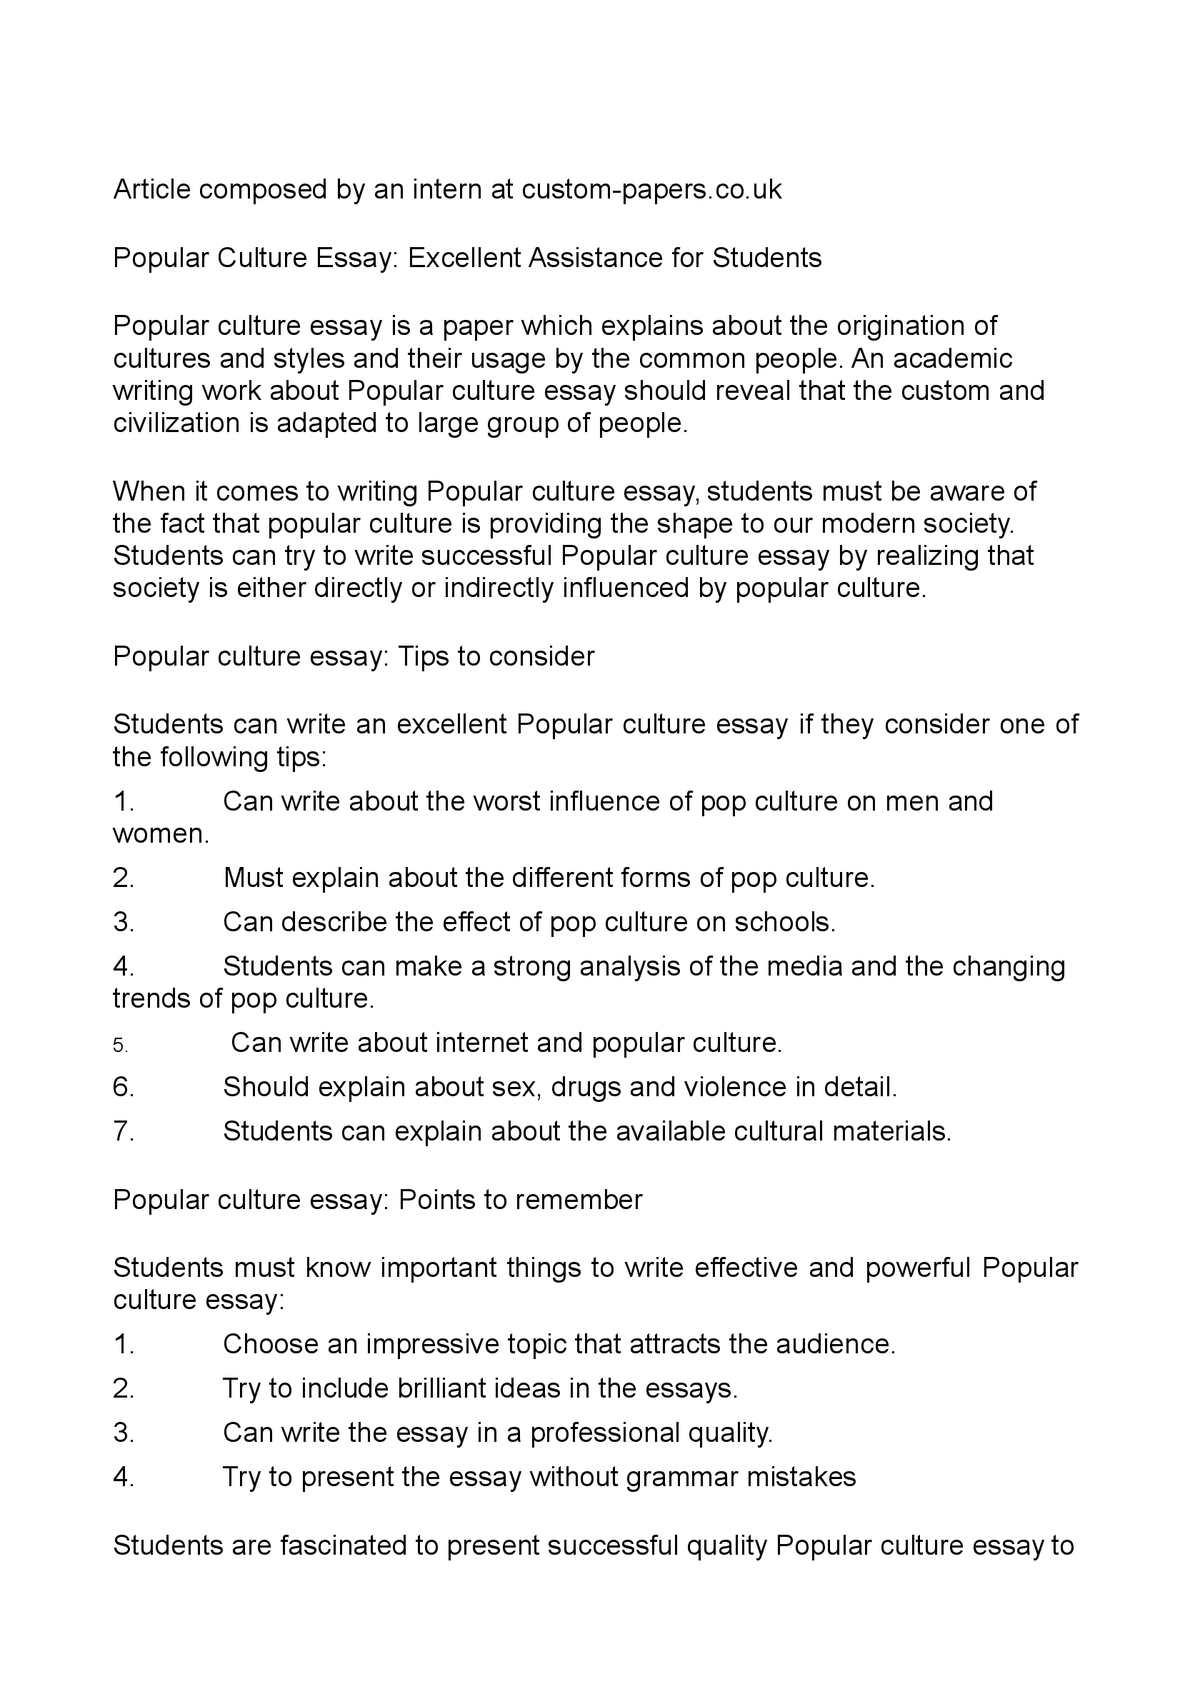 006 Essay Example P1 Pop Top Culture Controversial Topics Religion And Popular 2018 Full